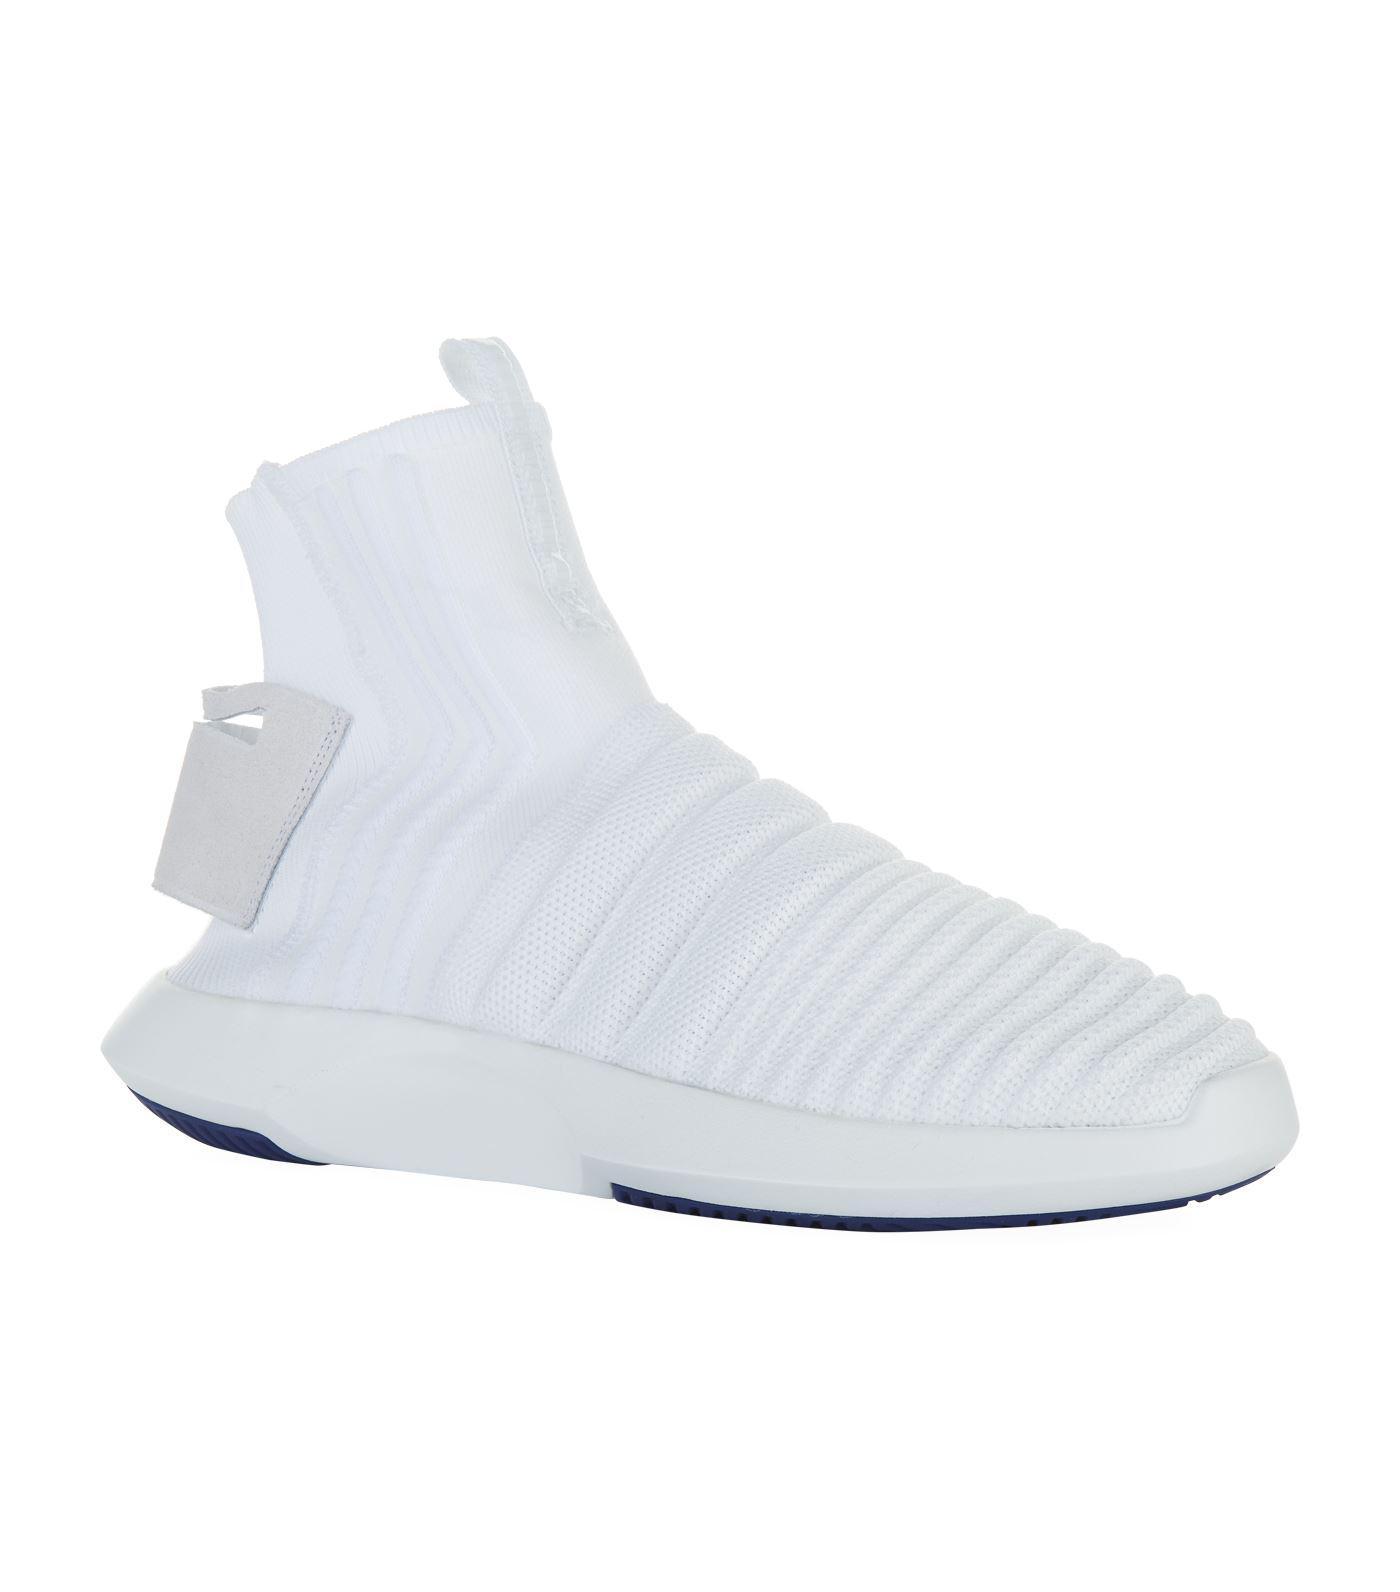 lyst adidas originali pazzo 1 avanzata primeknit sock scarpe bianche